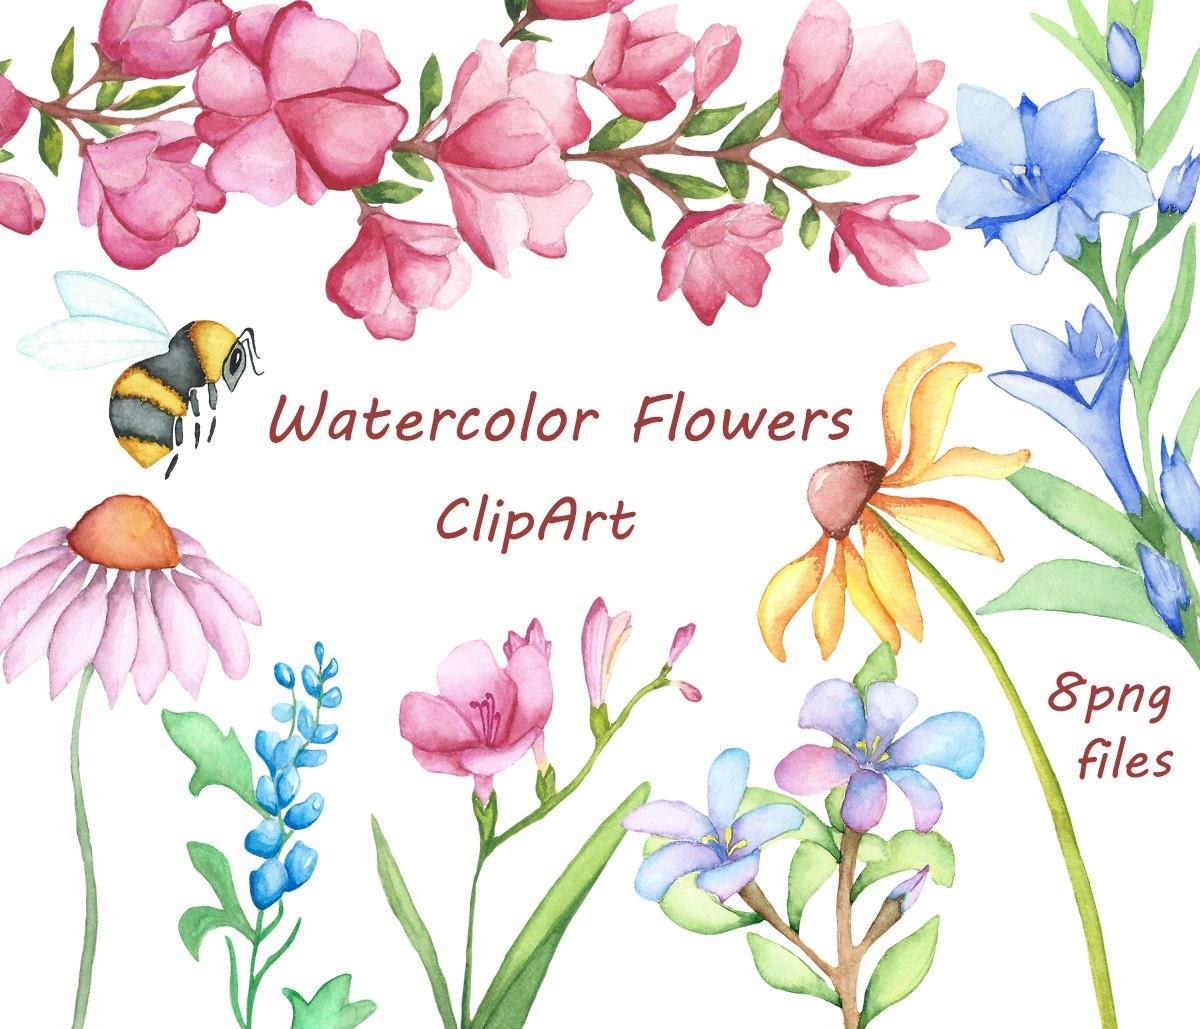 Watercolor Flowers Clipart Digital Clipart watercolor